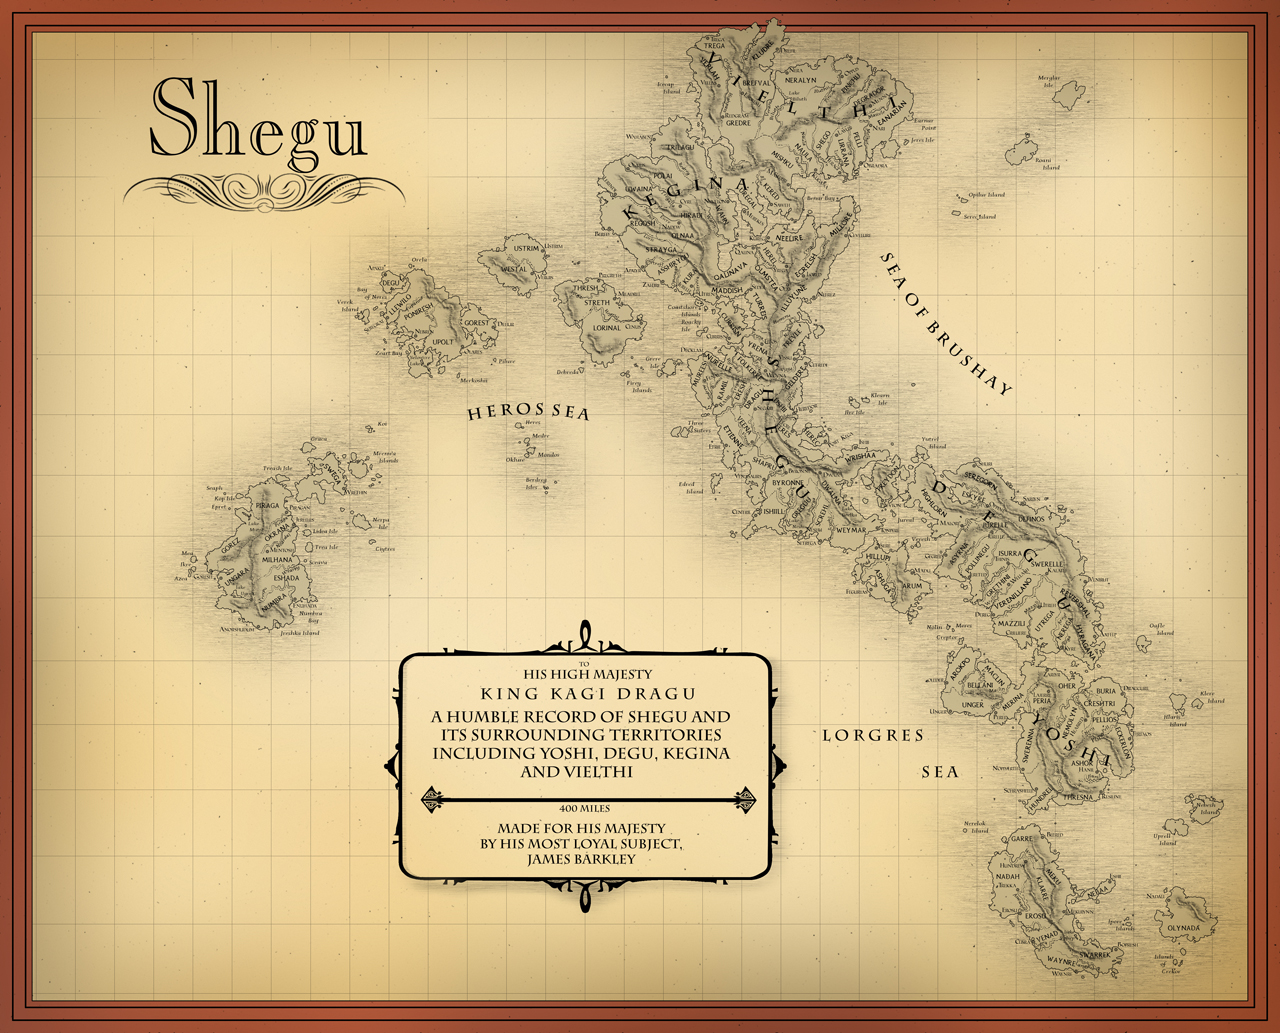 Shegu